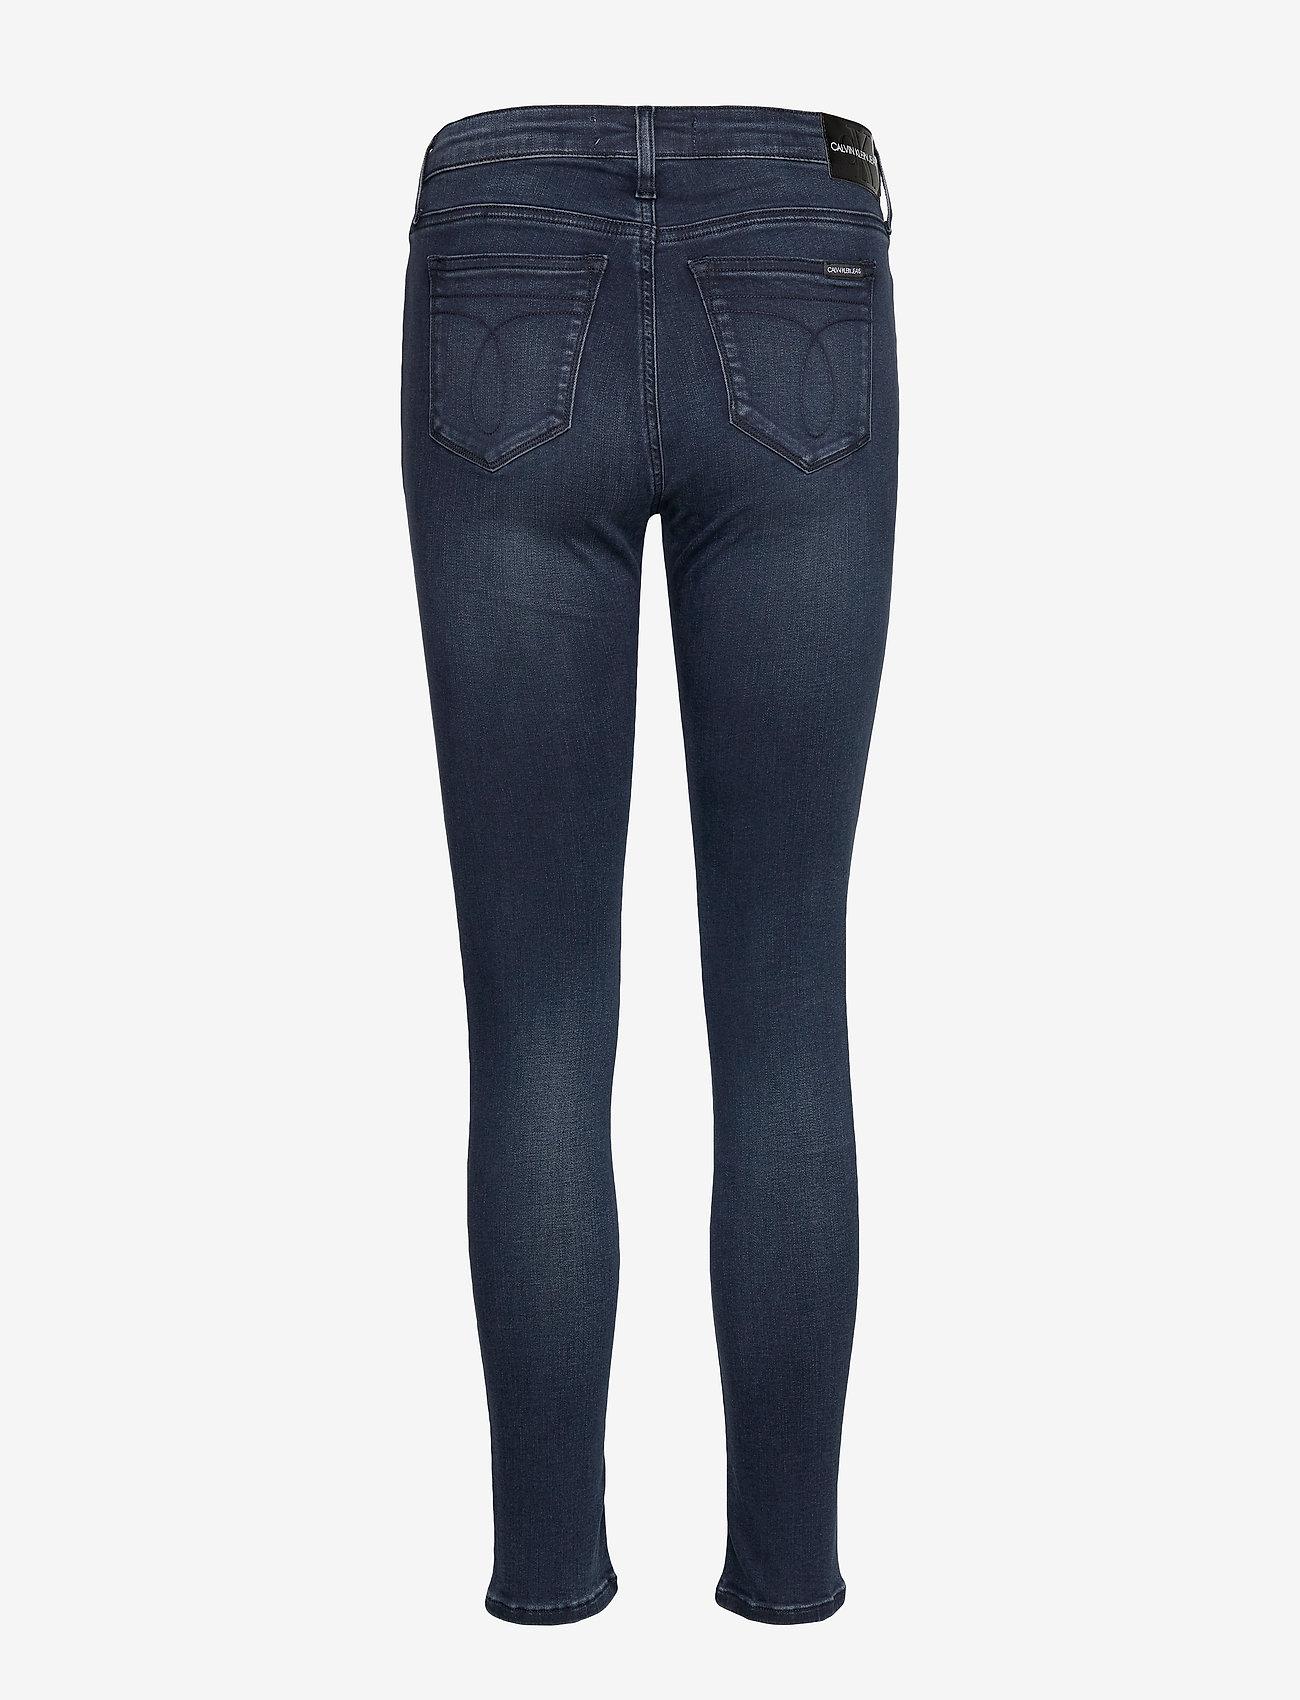 Ckj 001 Super Skinny (Ca033 Blue Black) - Calvin Klein Jeans Gy50kK